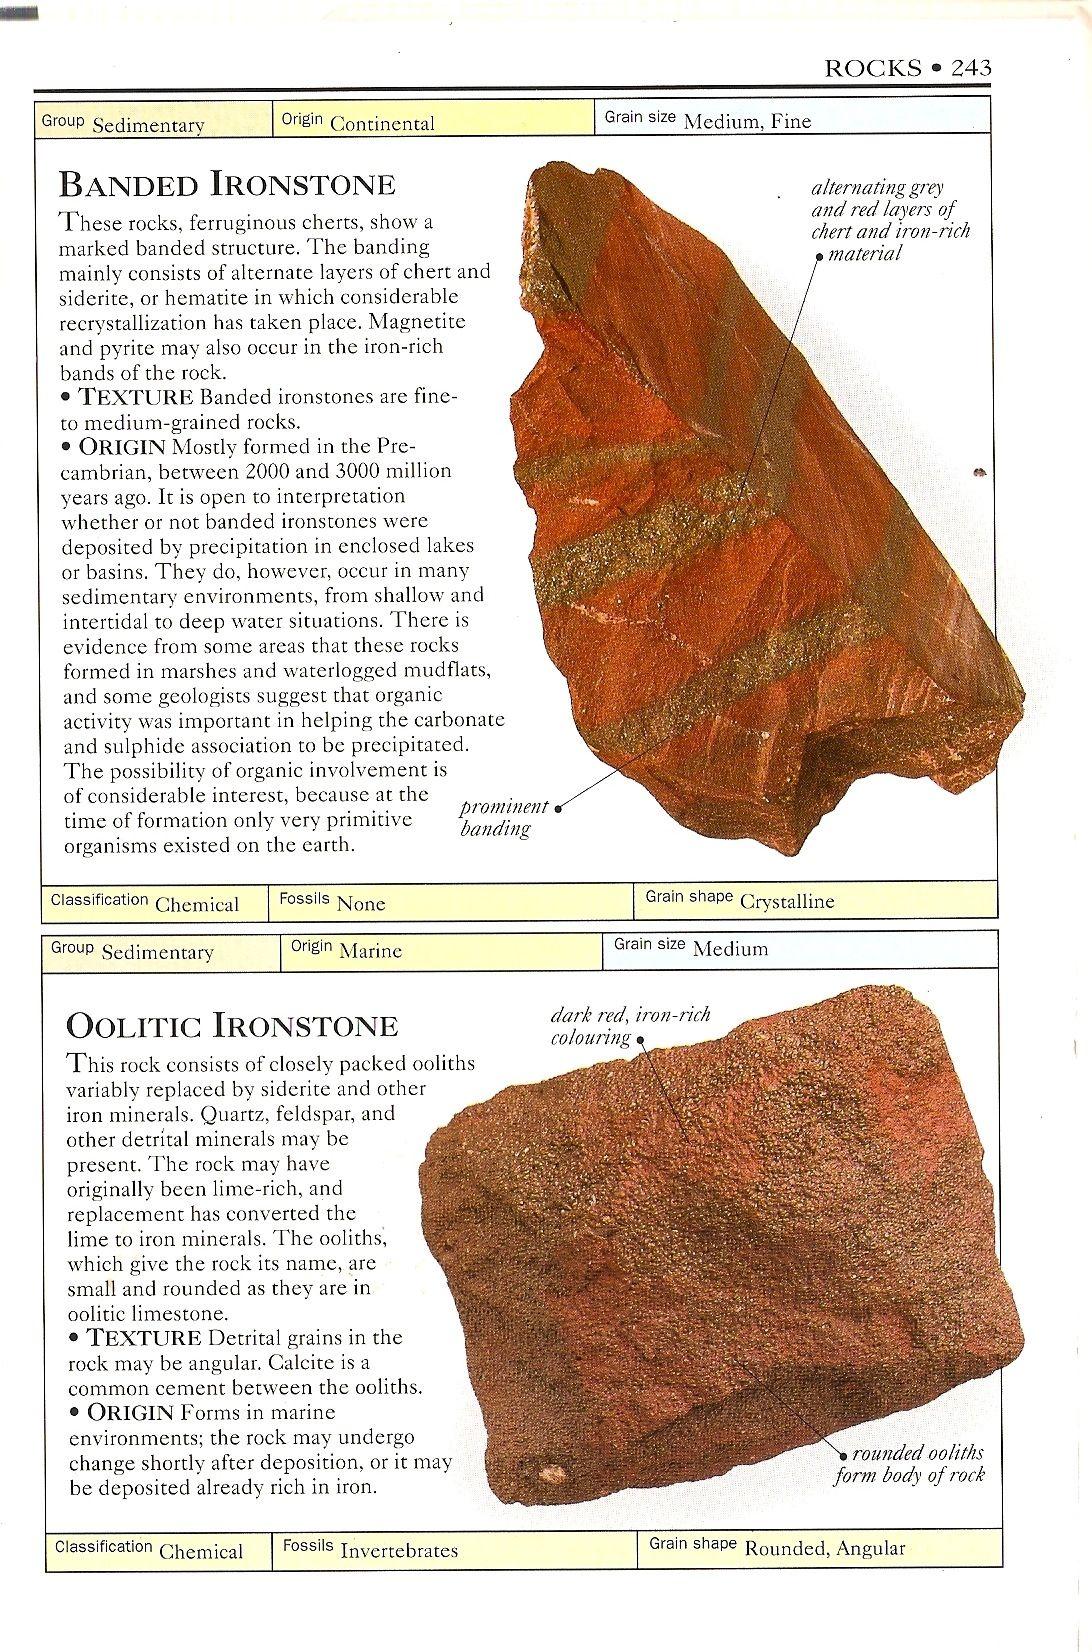 Ironstone Gypsum Crystal Rocks And Gems Rocks And Crystals